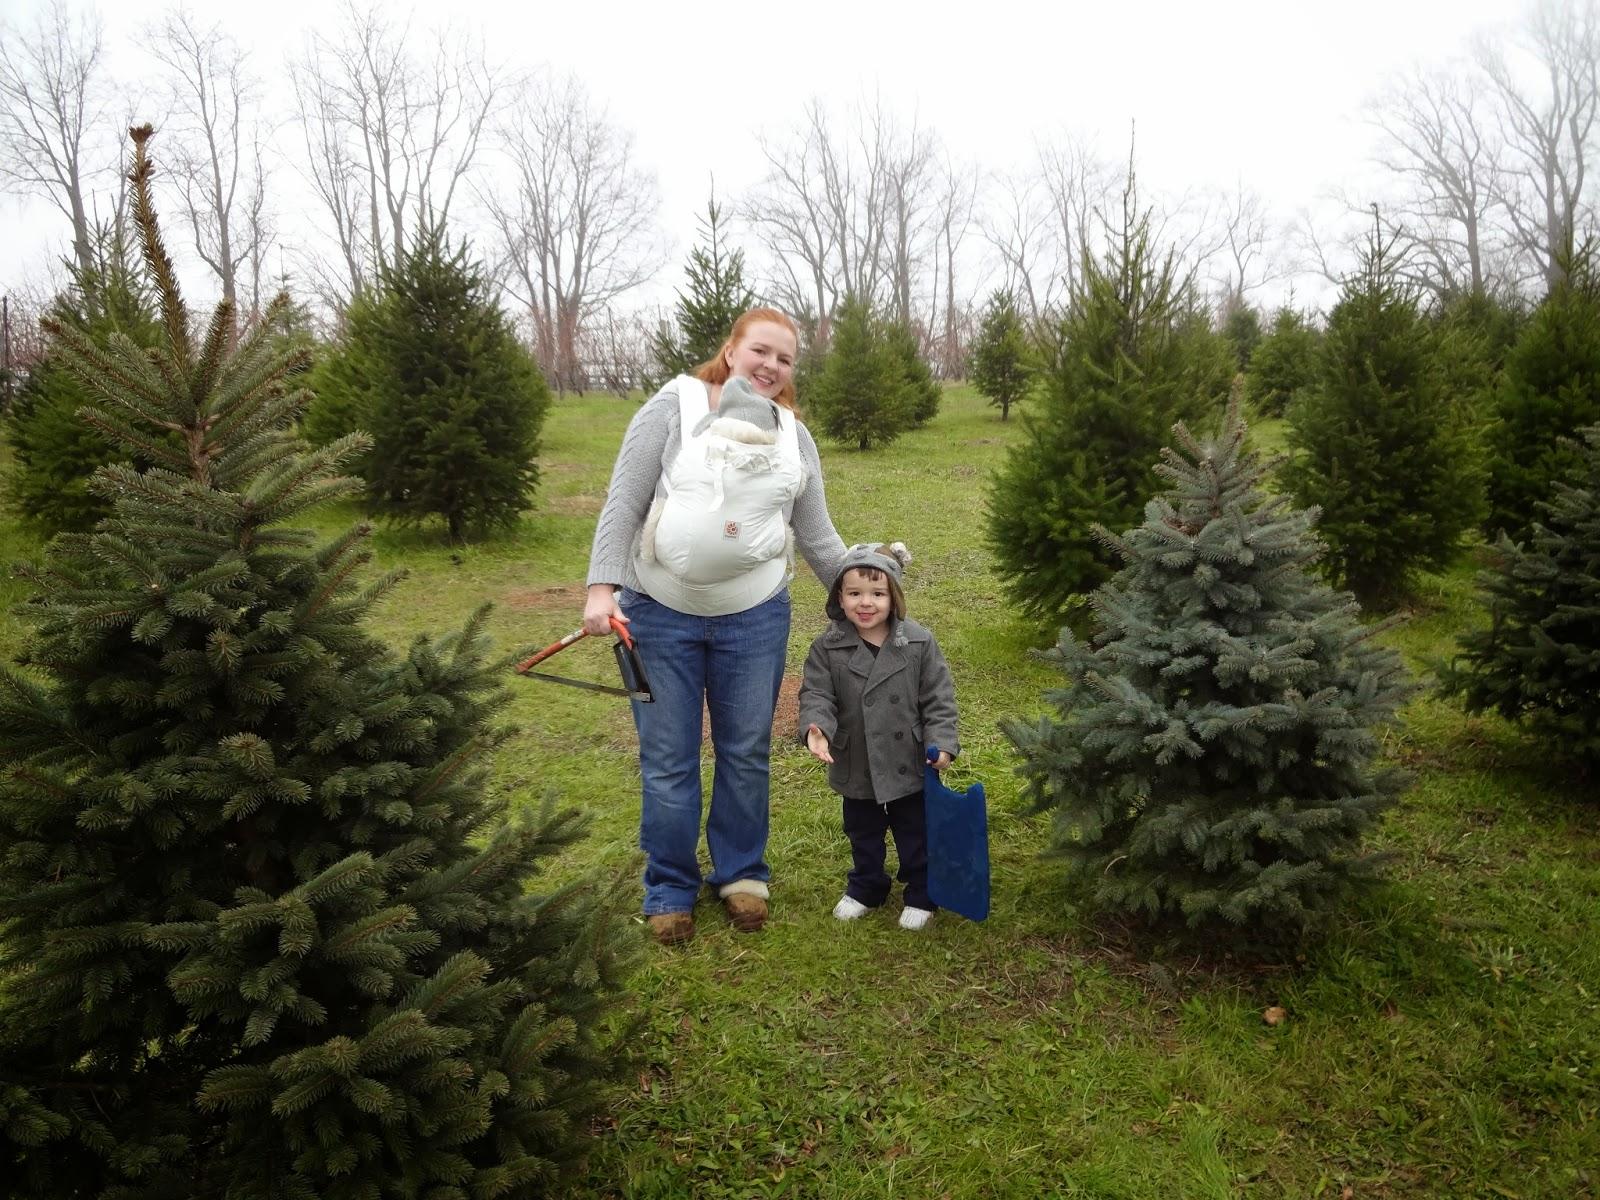 2304 Miles Christmas Tree Farms Old Stone Farm And Evergreen Acres - Christmas Tree Farm In Virginia